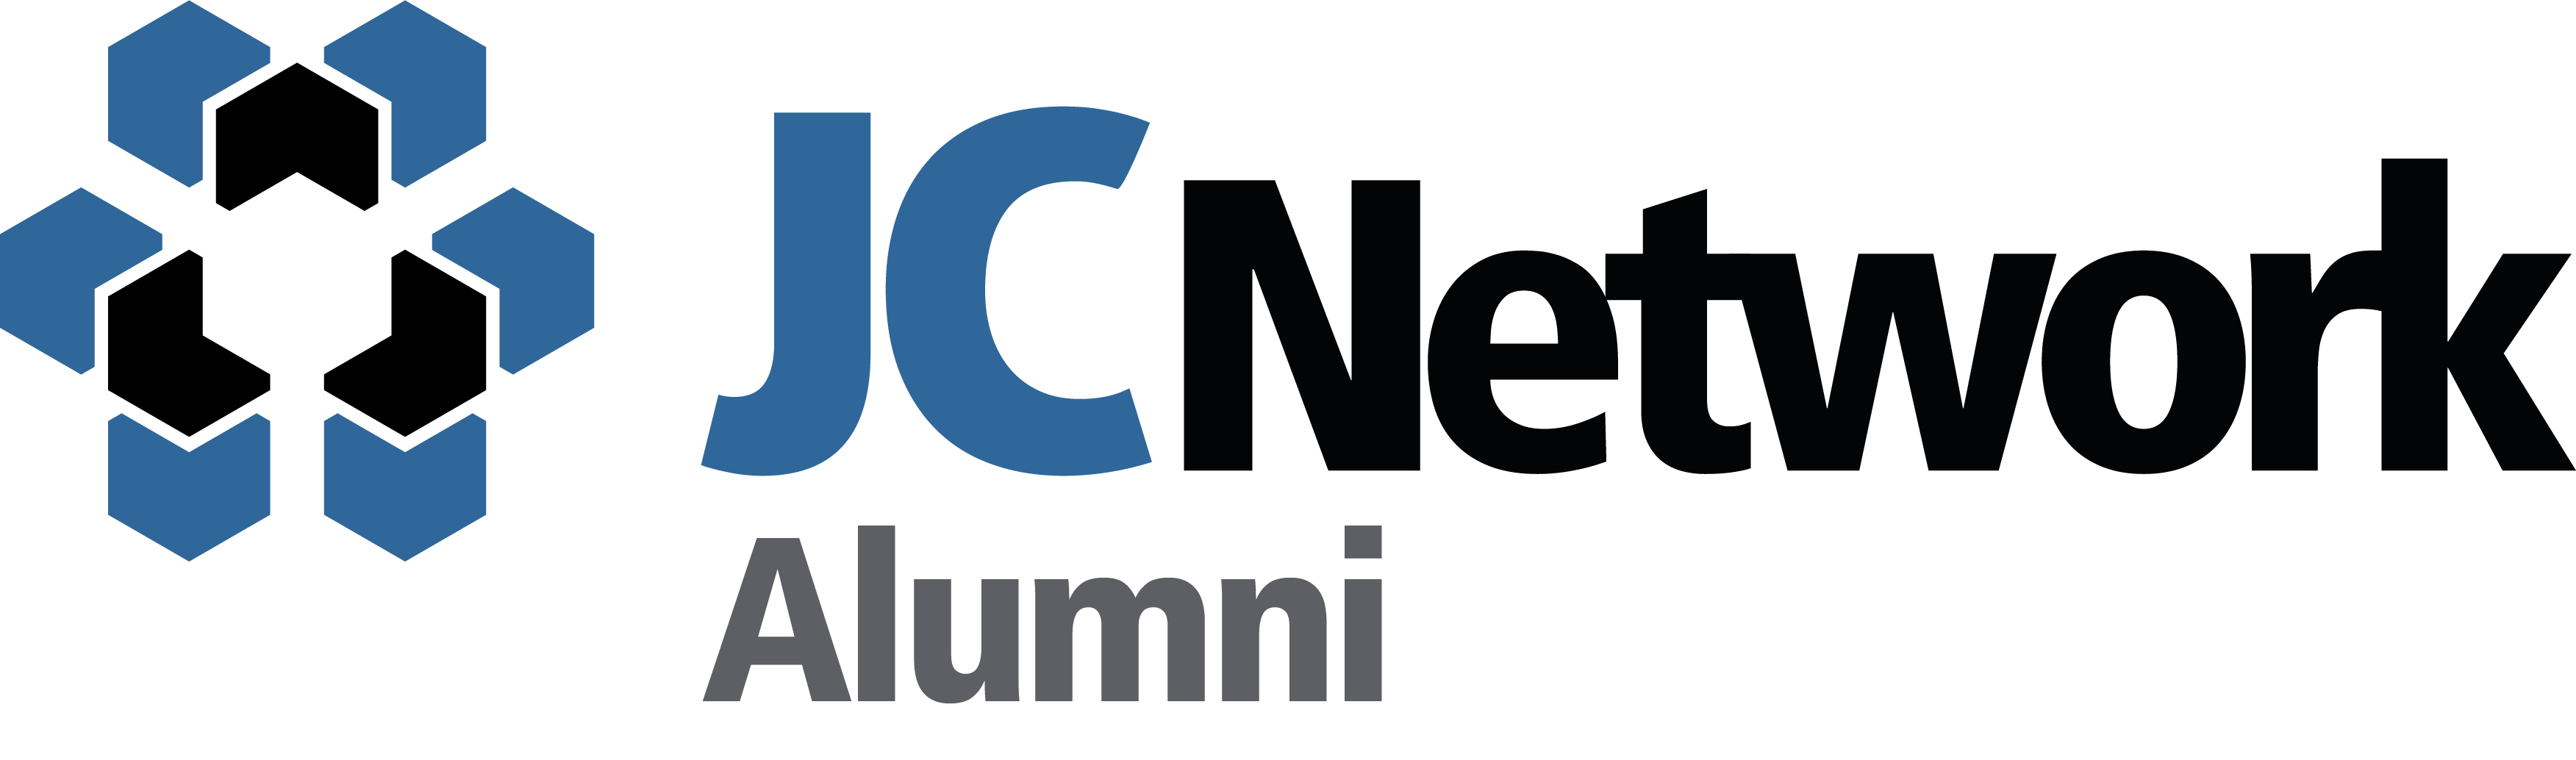 Logo_JCNetwork_Alumni